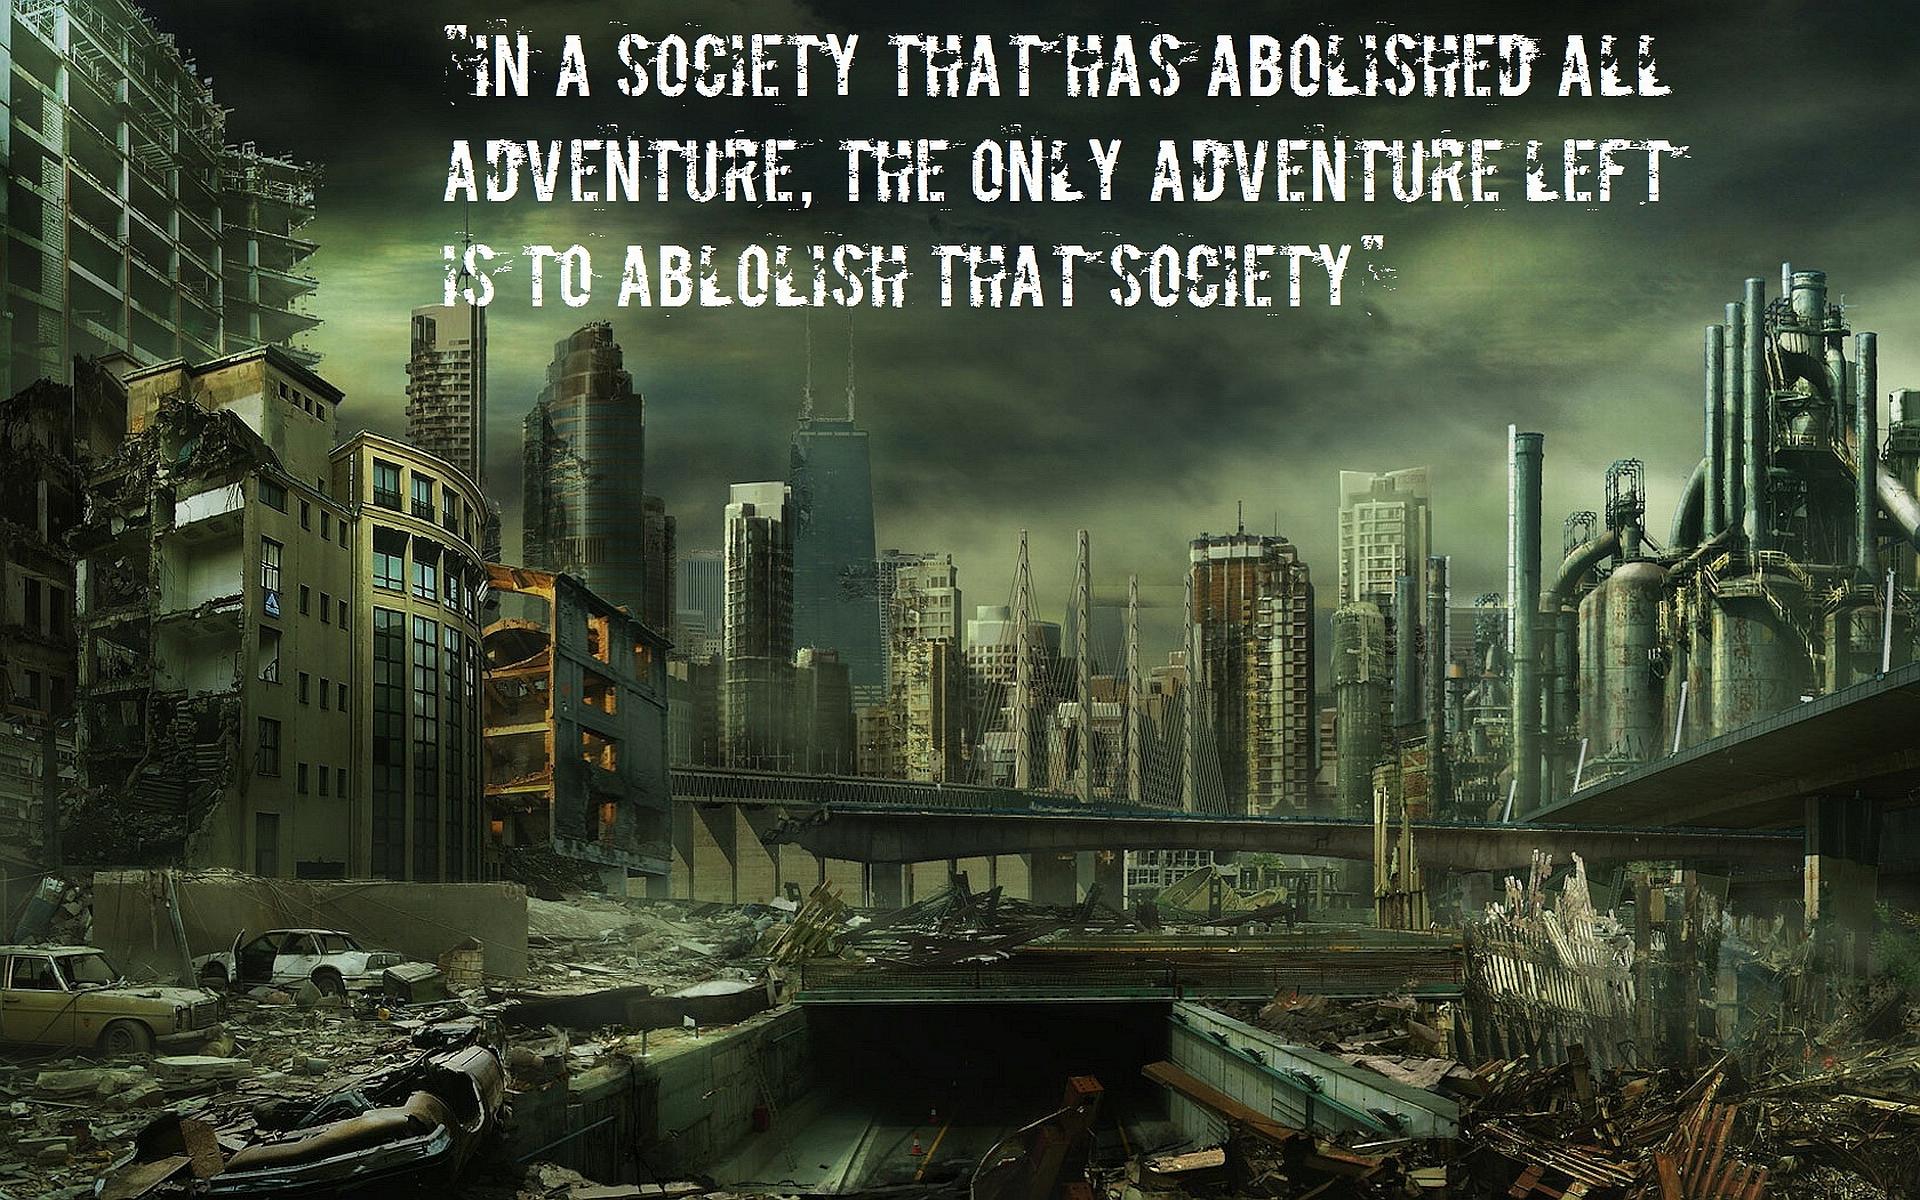 Dark horror evil sci fi post apocalyptic apocalypse ...